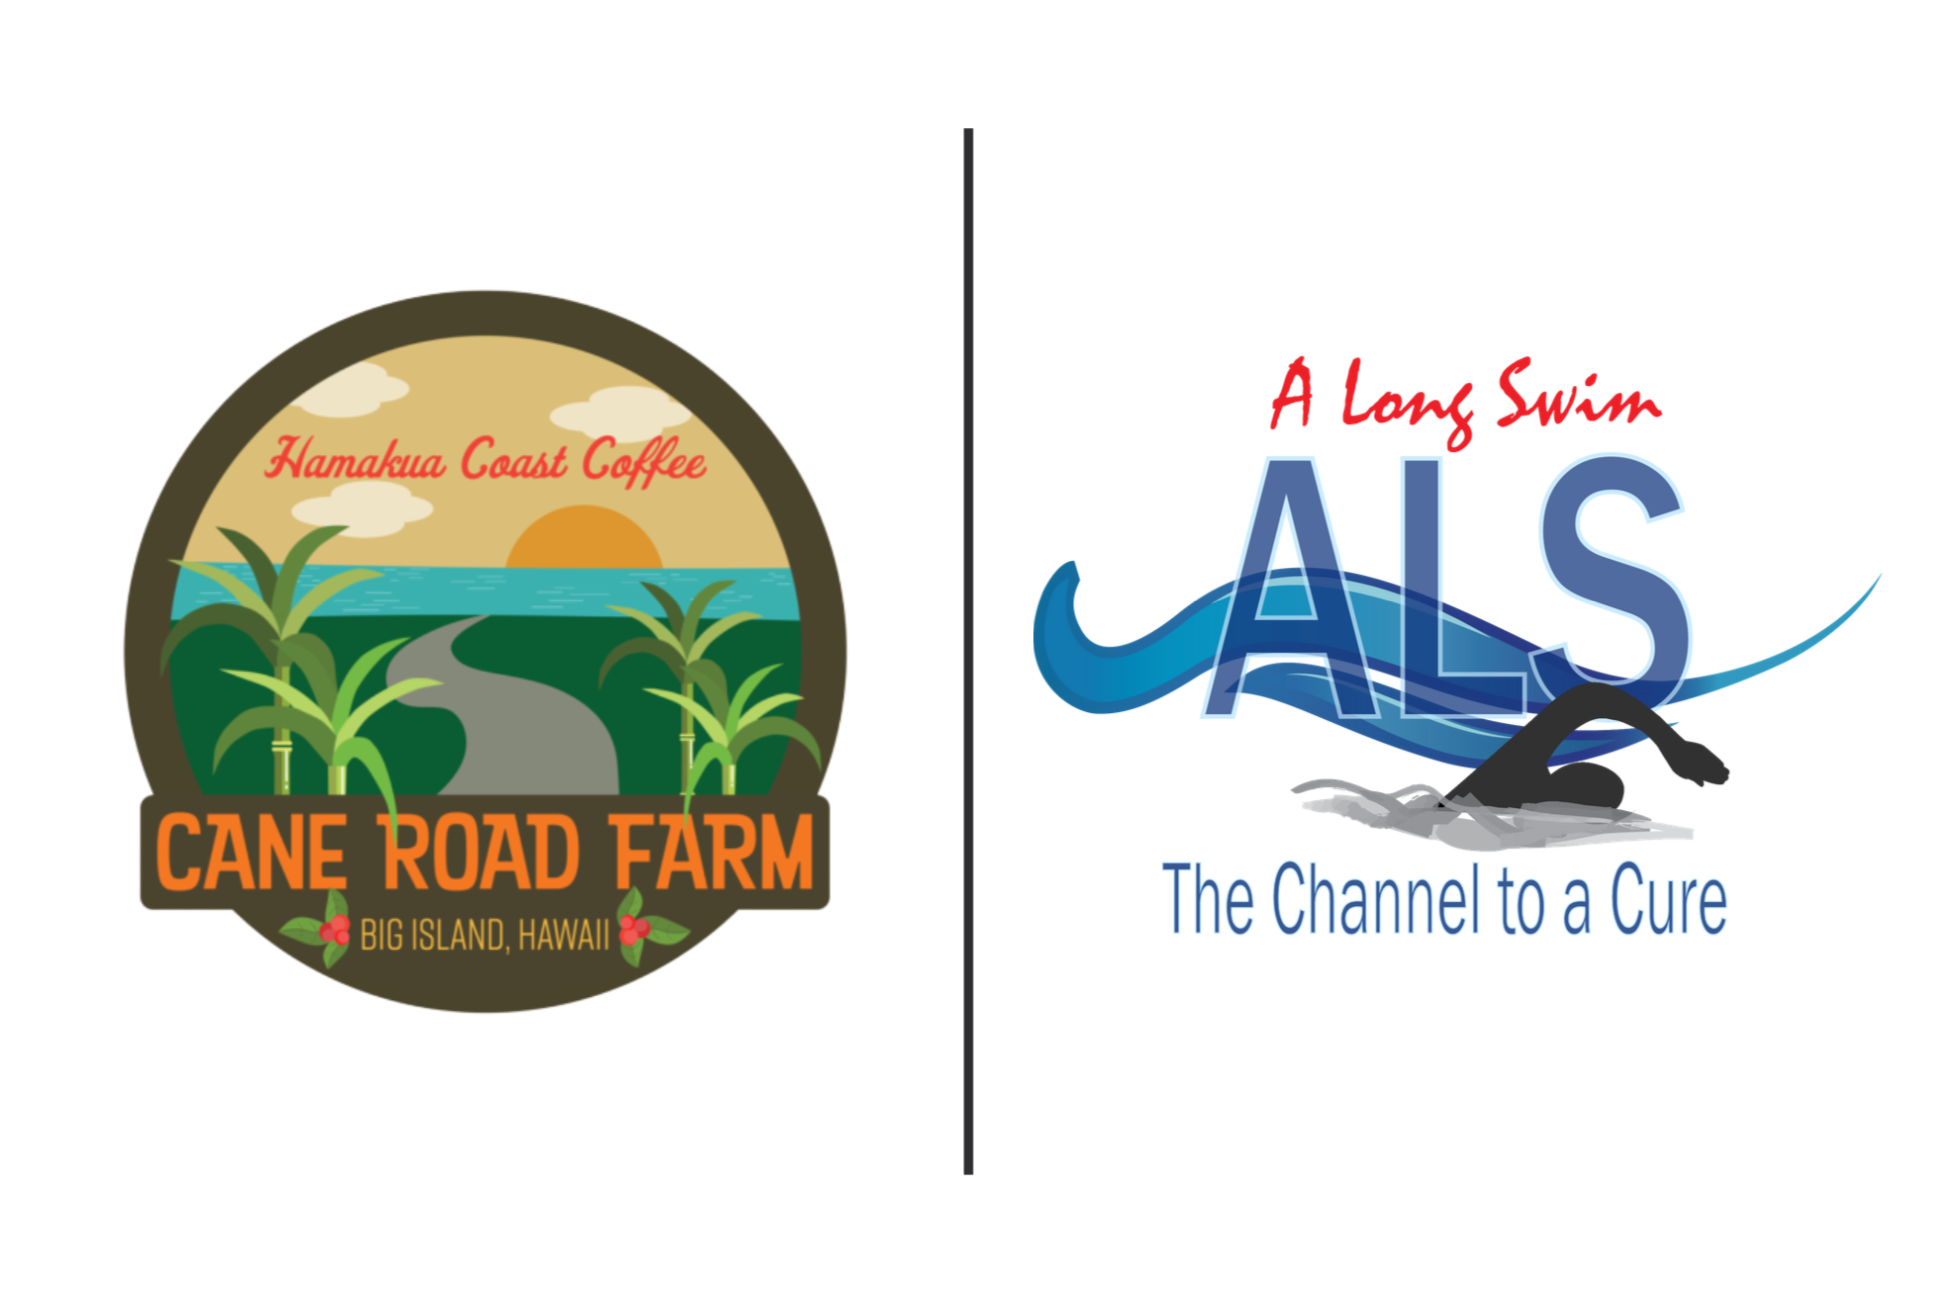 Cane Road Farm Coffee Hawaii and A Long Swim ALS